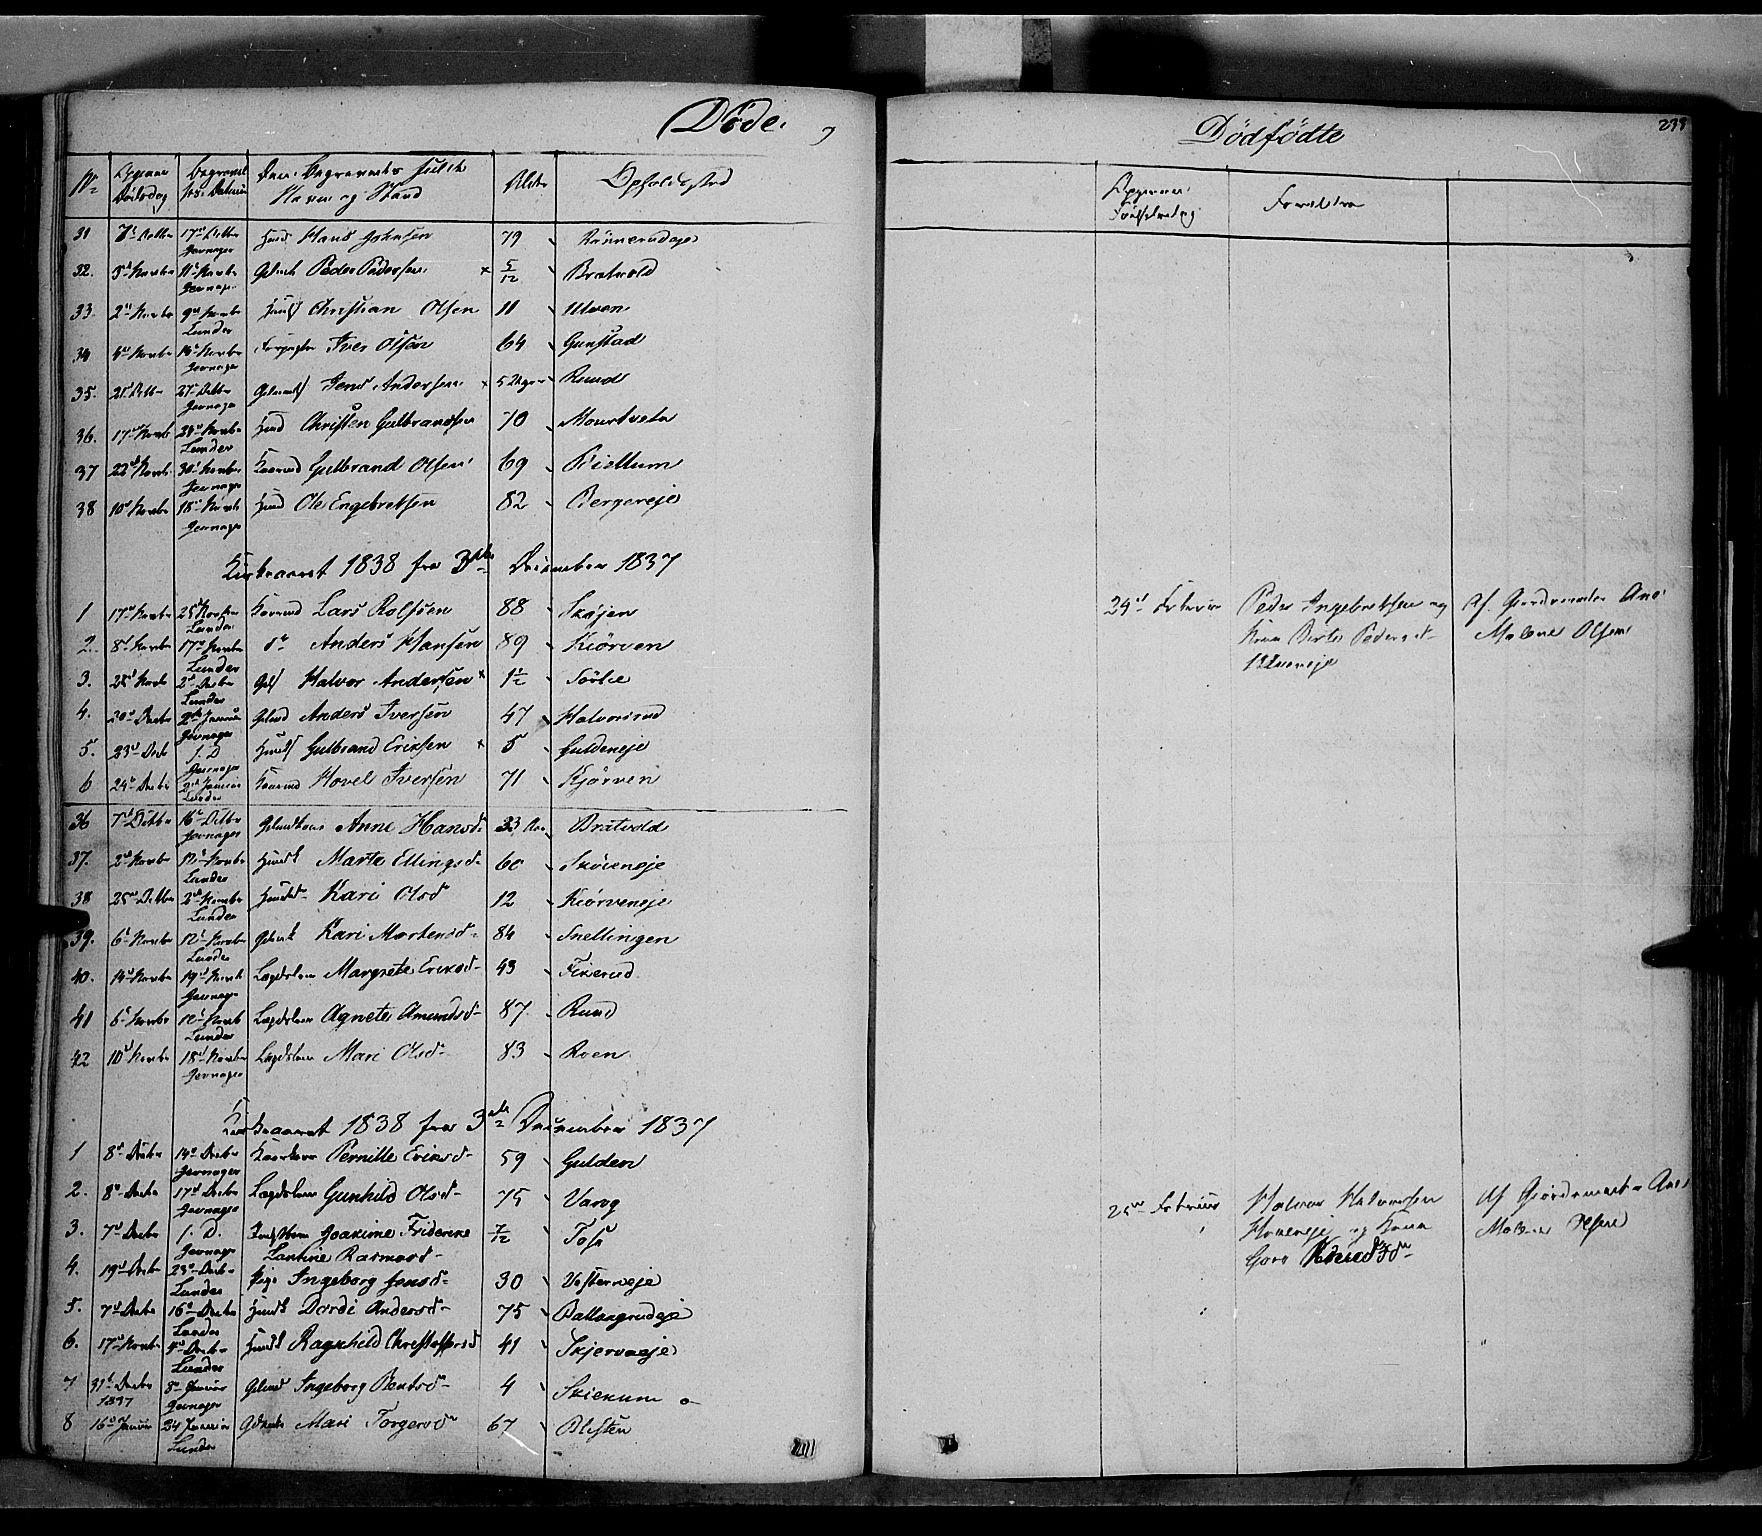 SAH, Jevnaker prestekontor, Ministerialbok nr. 6, 1837-1857, s. 233